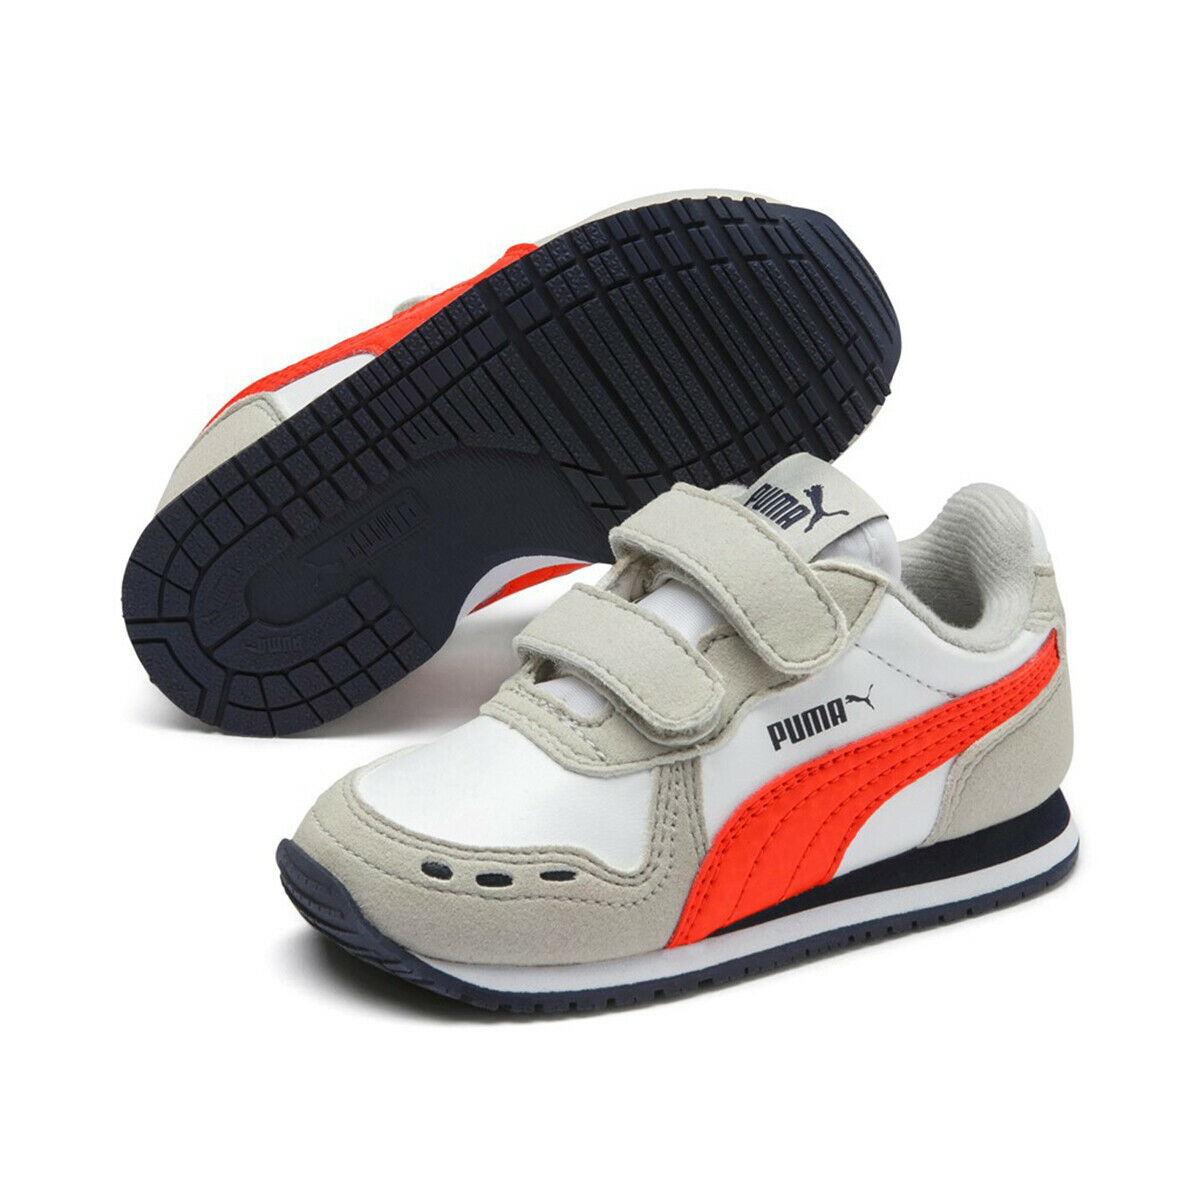 Puma Sneakers dunkelblau weiß Kinder Gr. 27